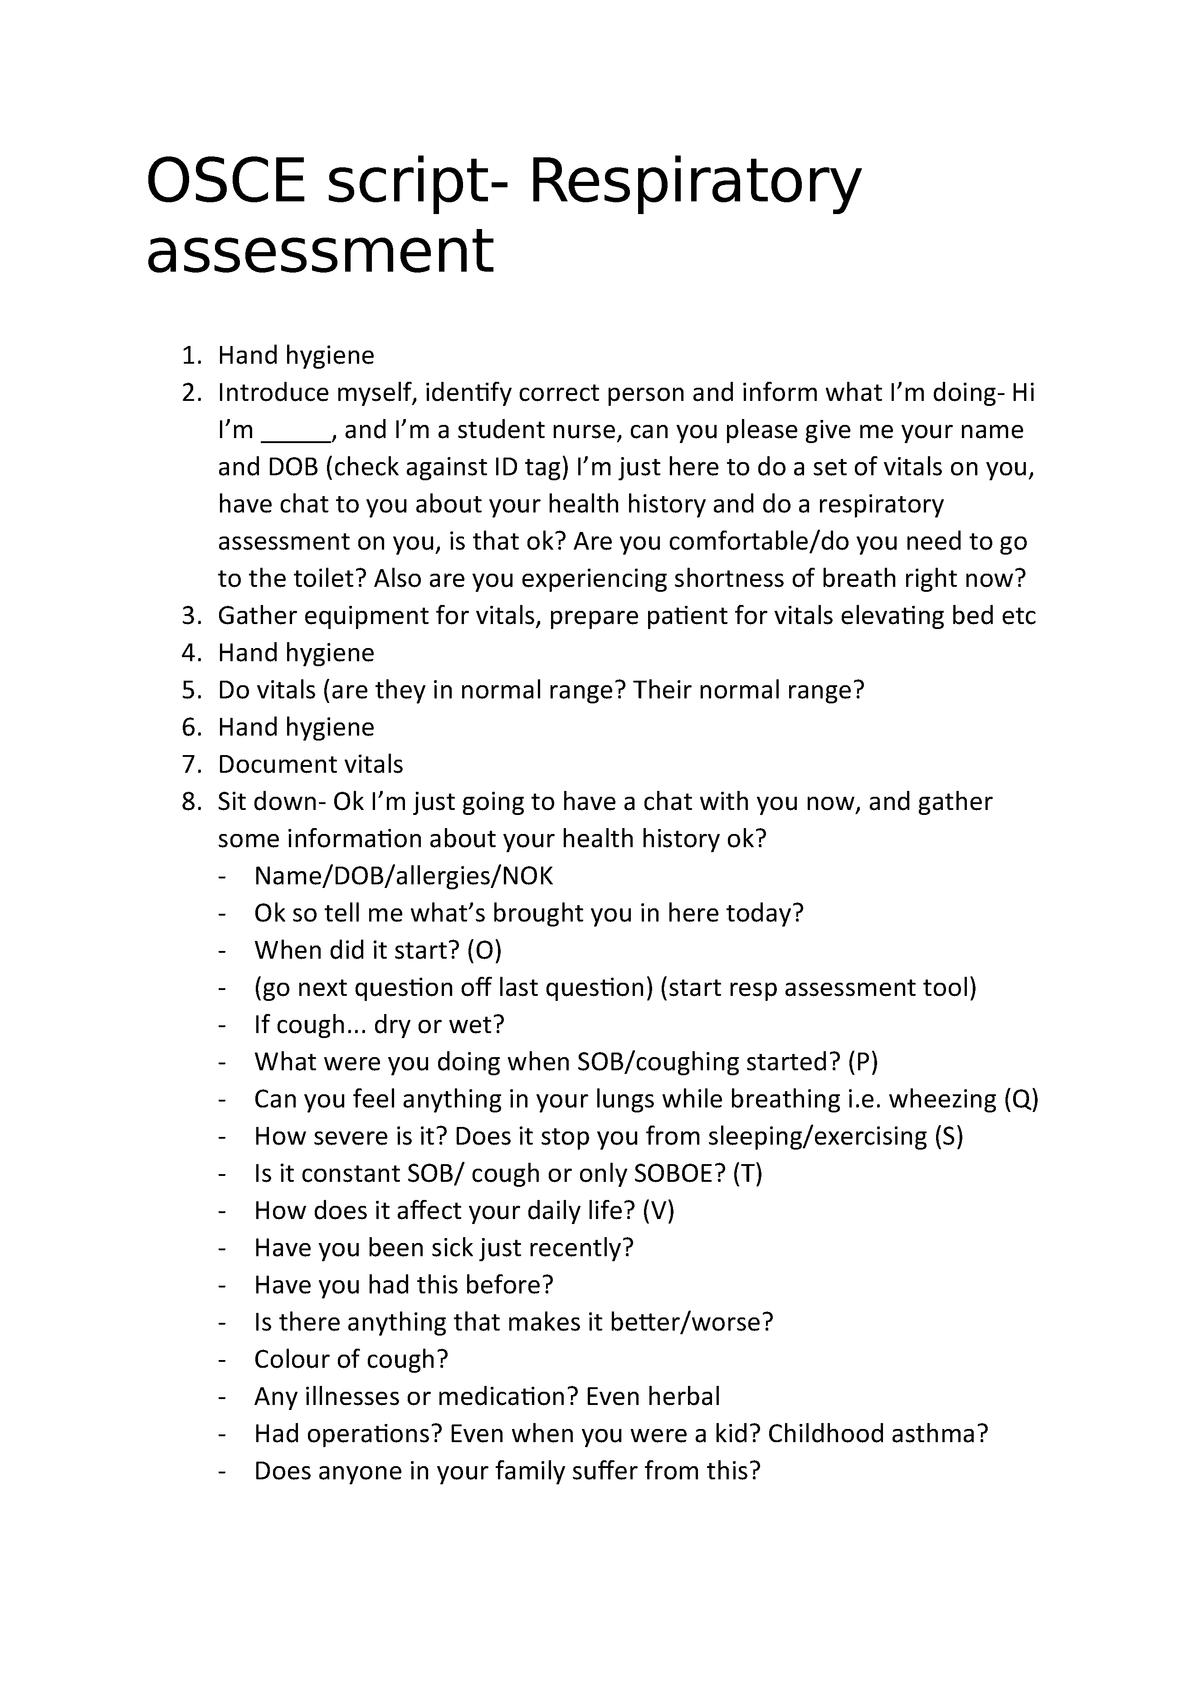 OSCE script- Respiratory assessment - NS2022:03 - JCU - StuDocu